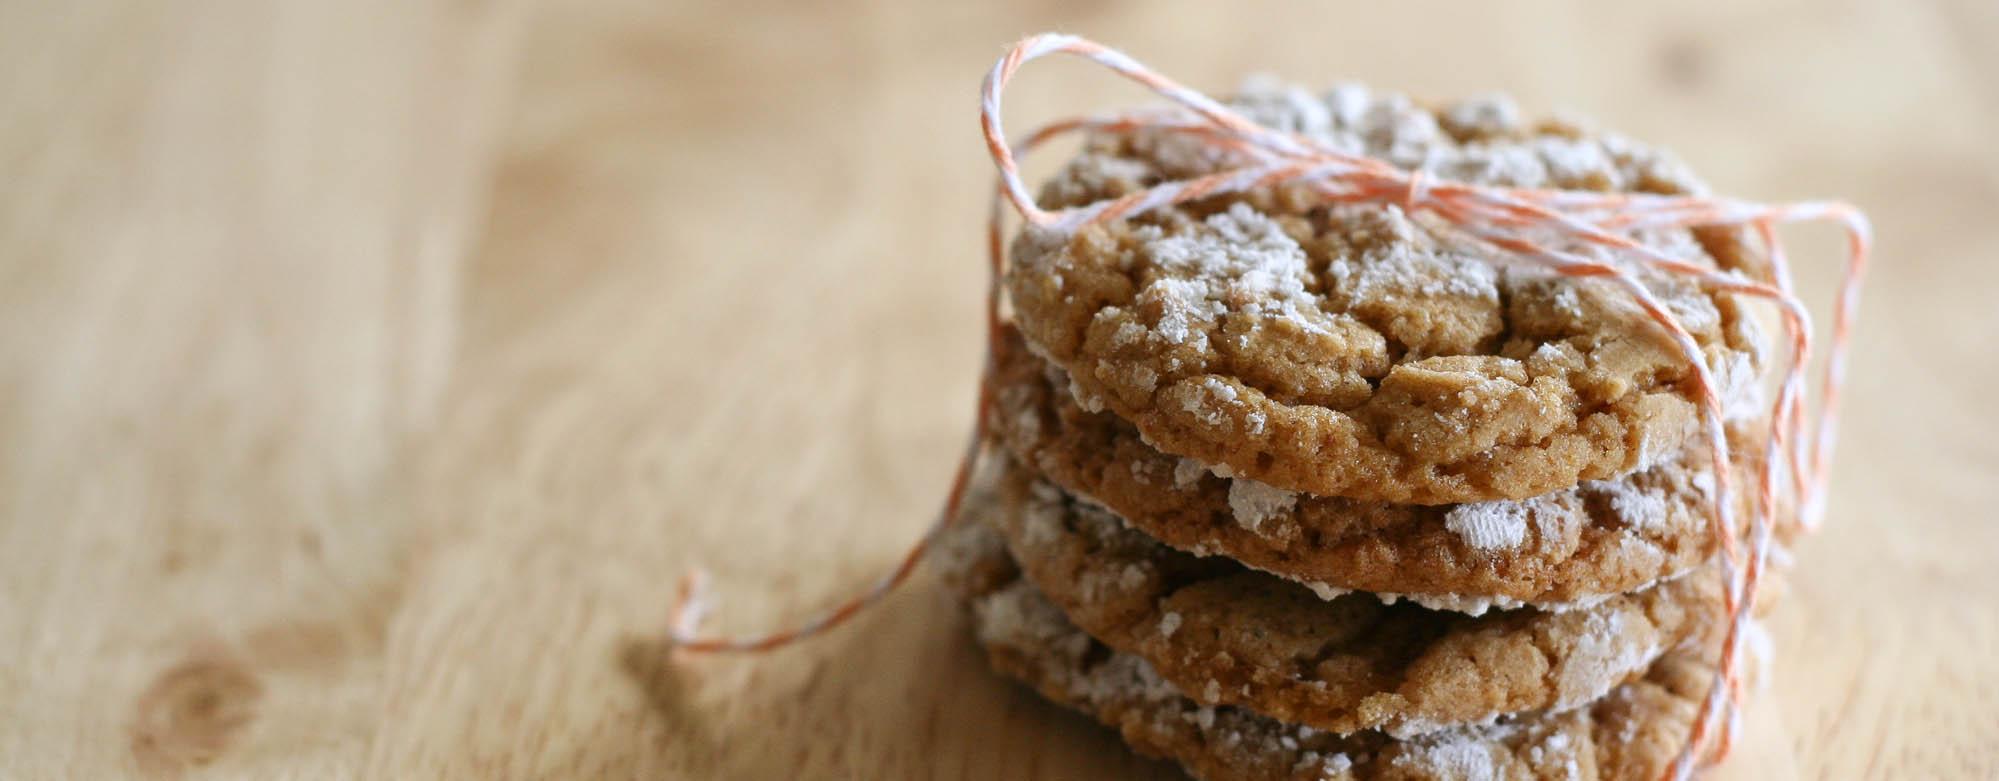 recipe: molasses crinkles recipe butter [3]